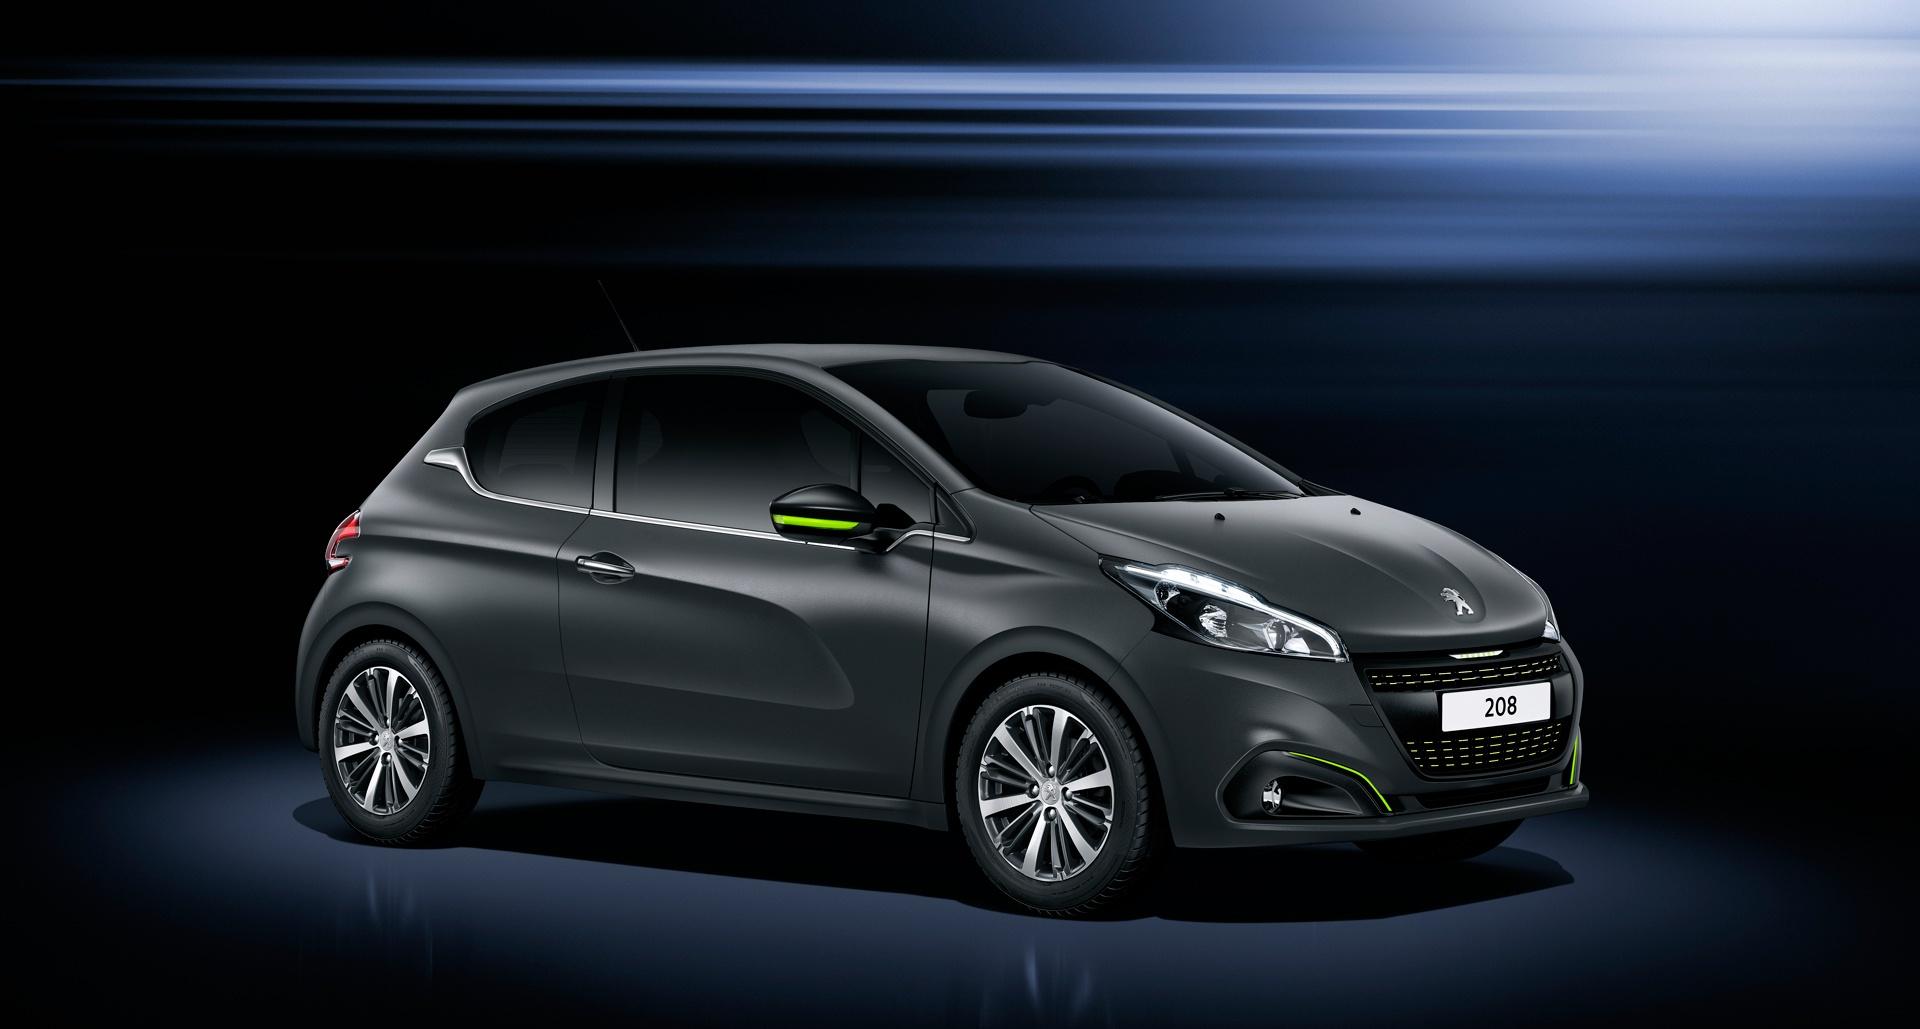 ВБритании начался прием заказов нахэтчбек Peugeot (Пежо) 208